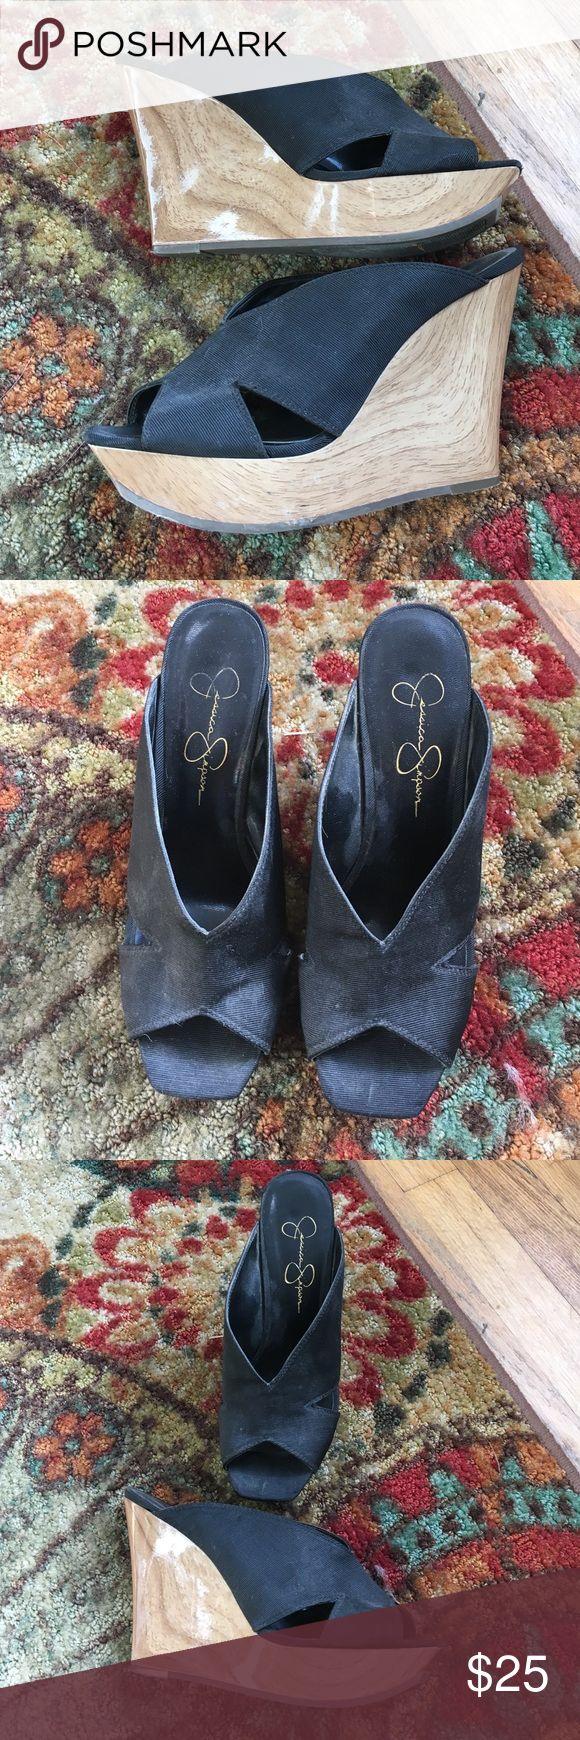 Jessica Simpson black slide wedge Size 7 Jessica Simpson Shoes Wedges